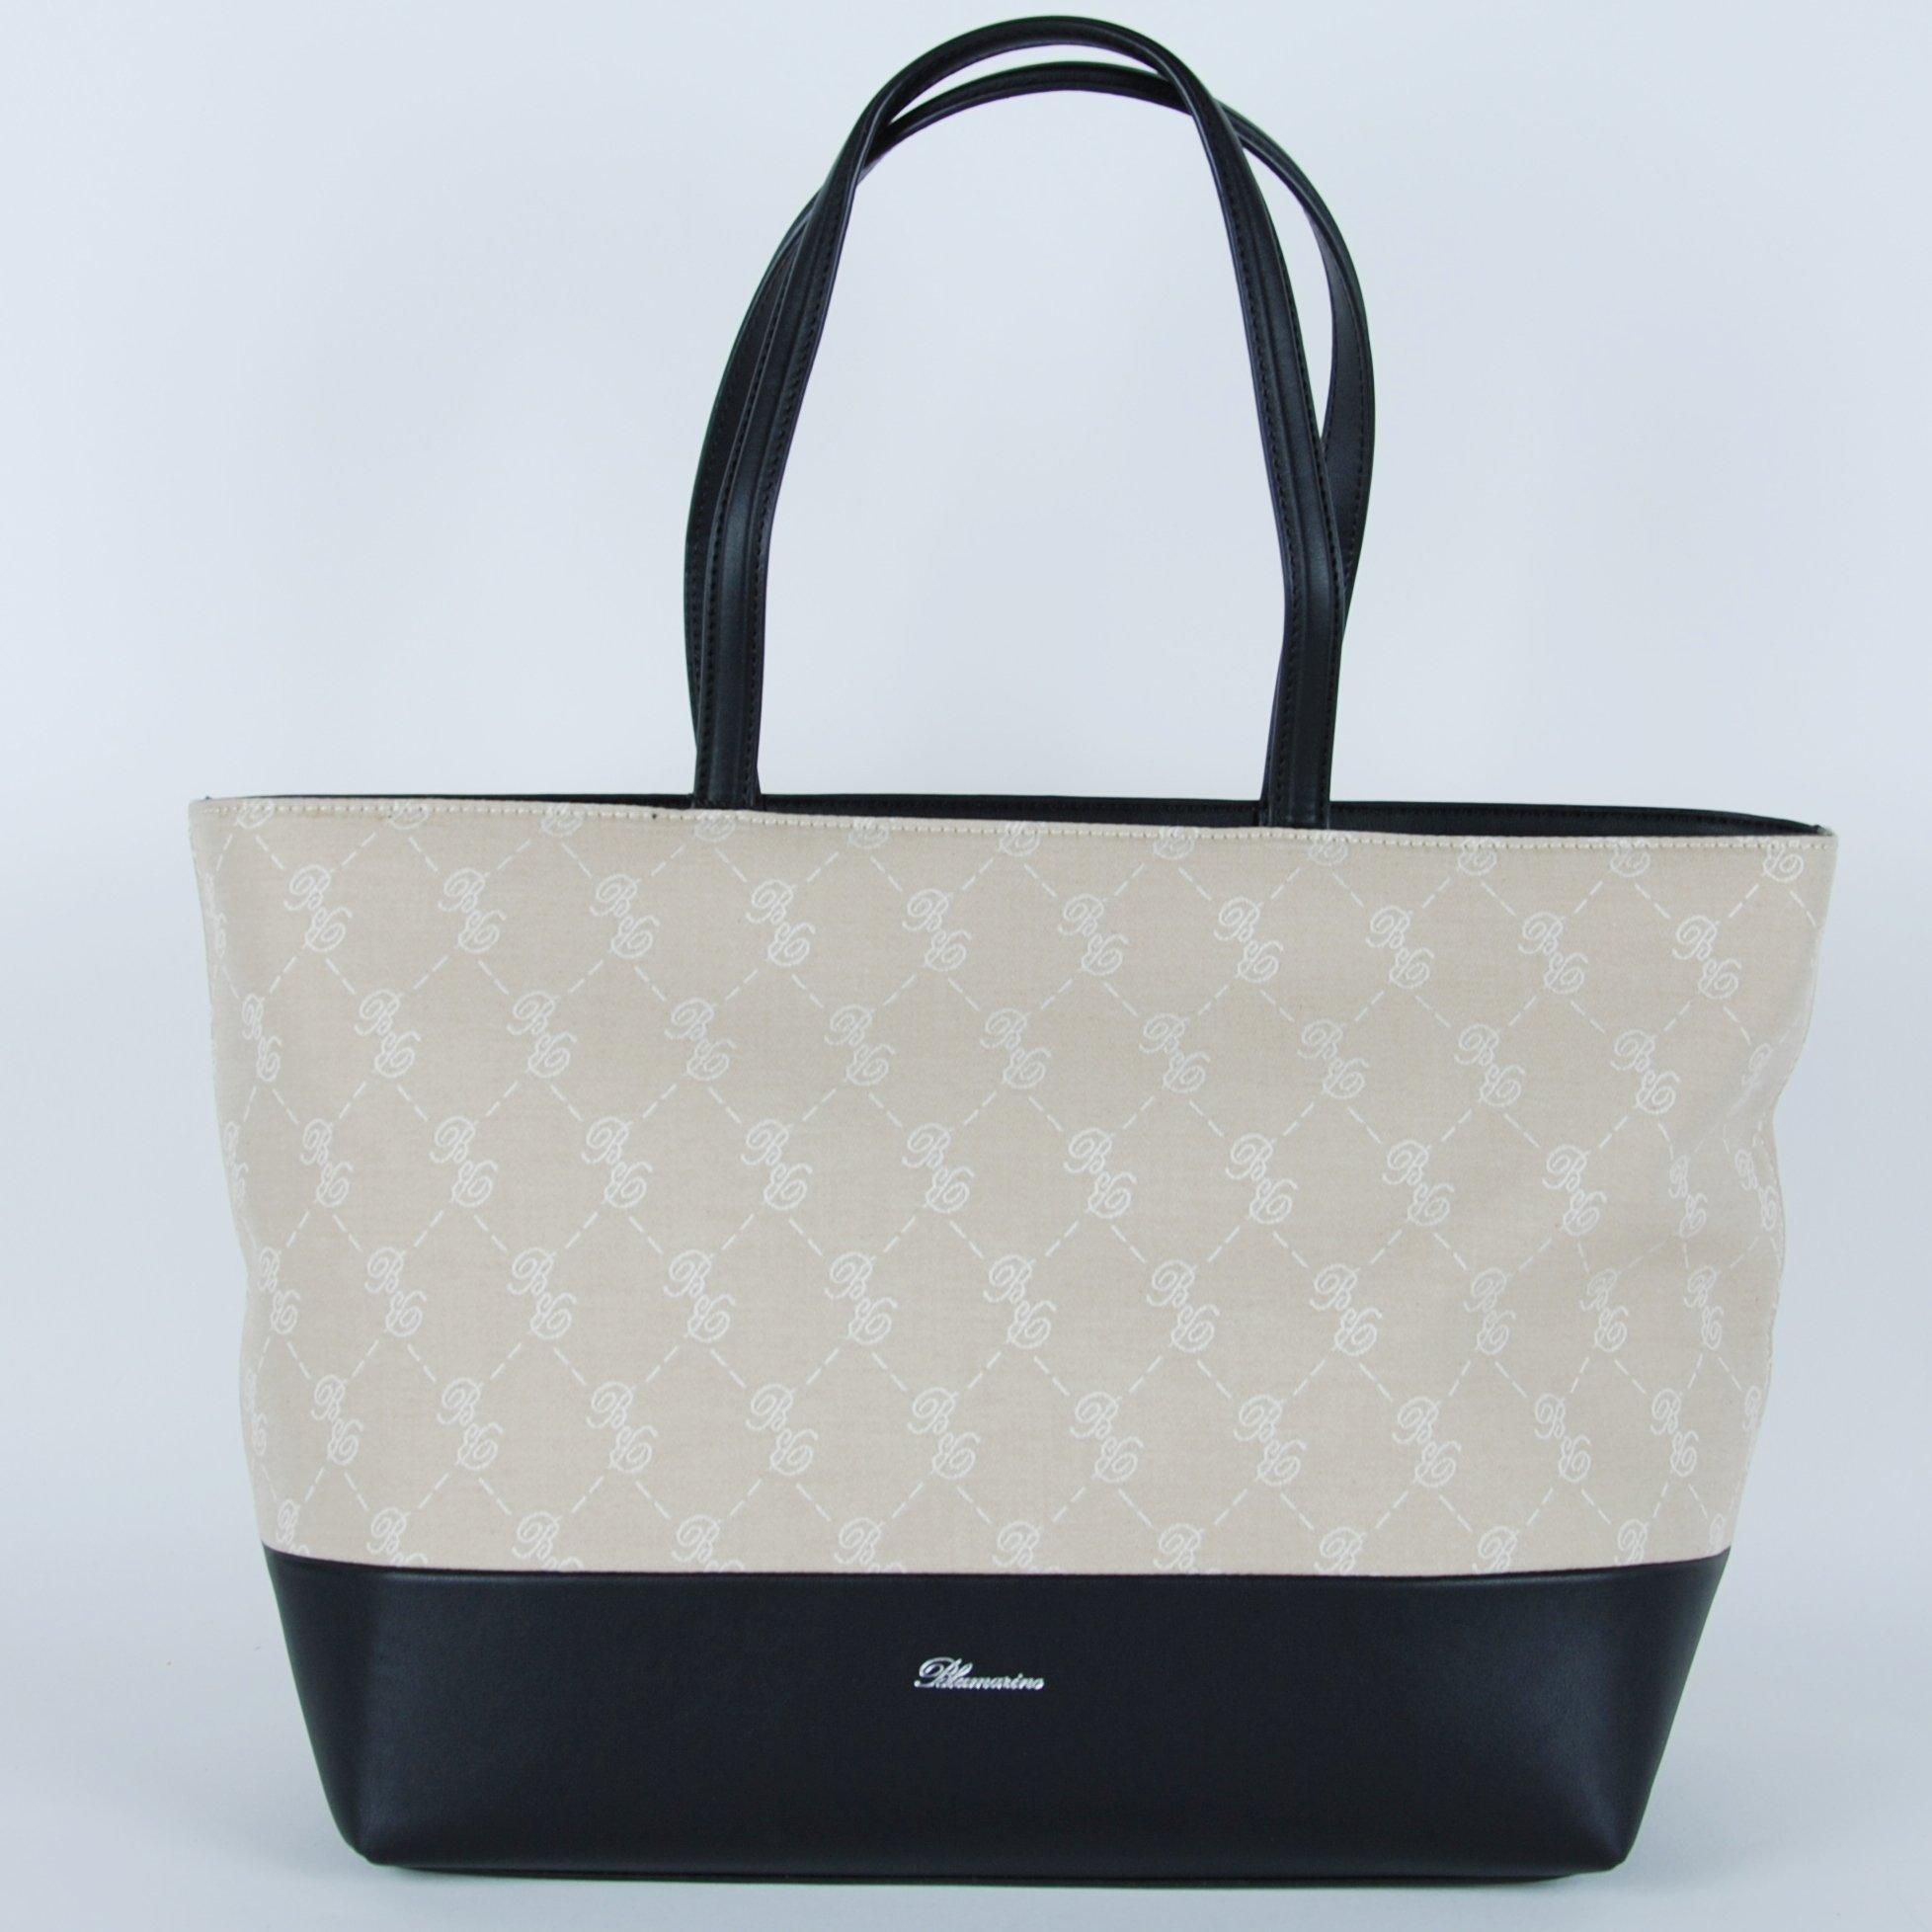 Blumarine Women's Shopping Bag Black BL1421484